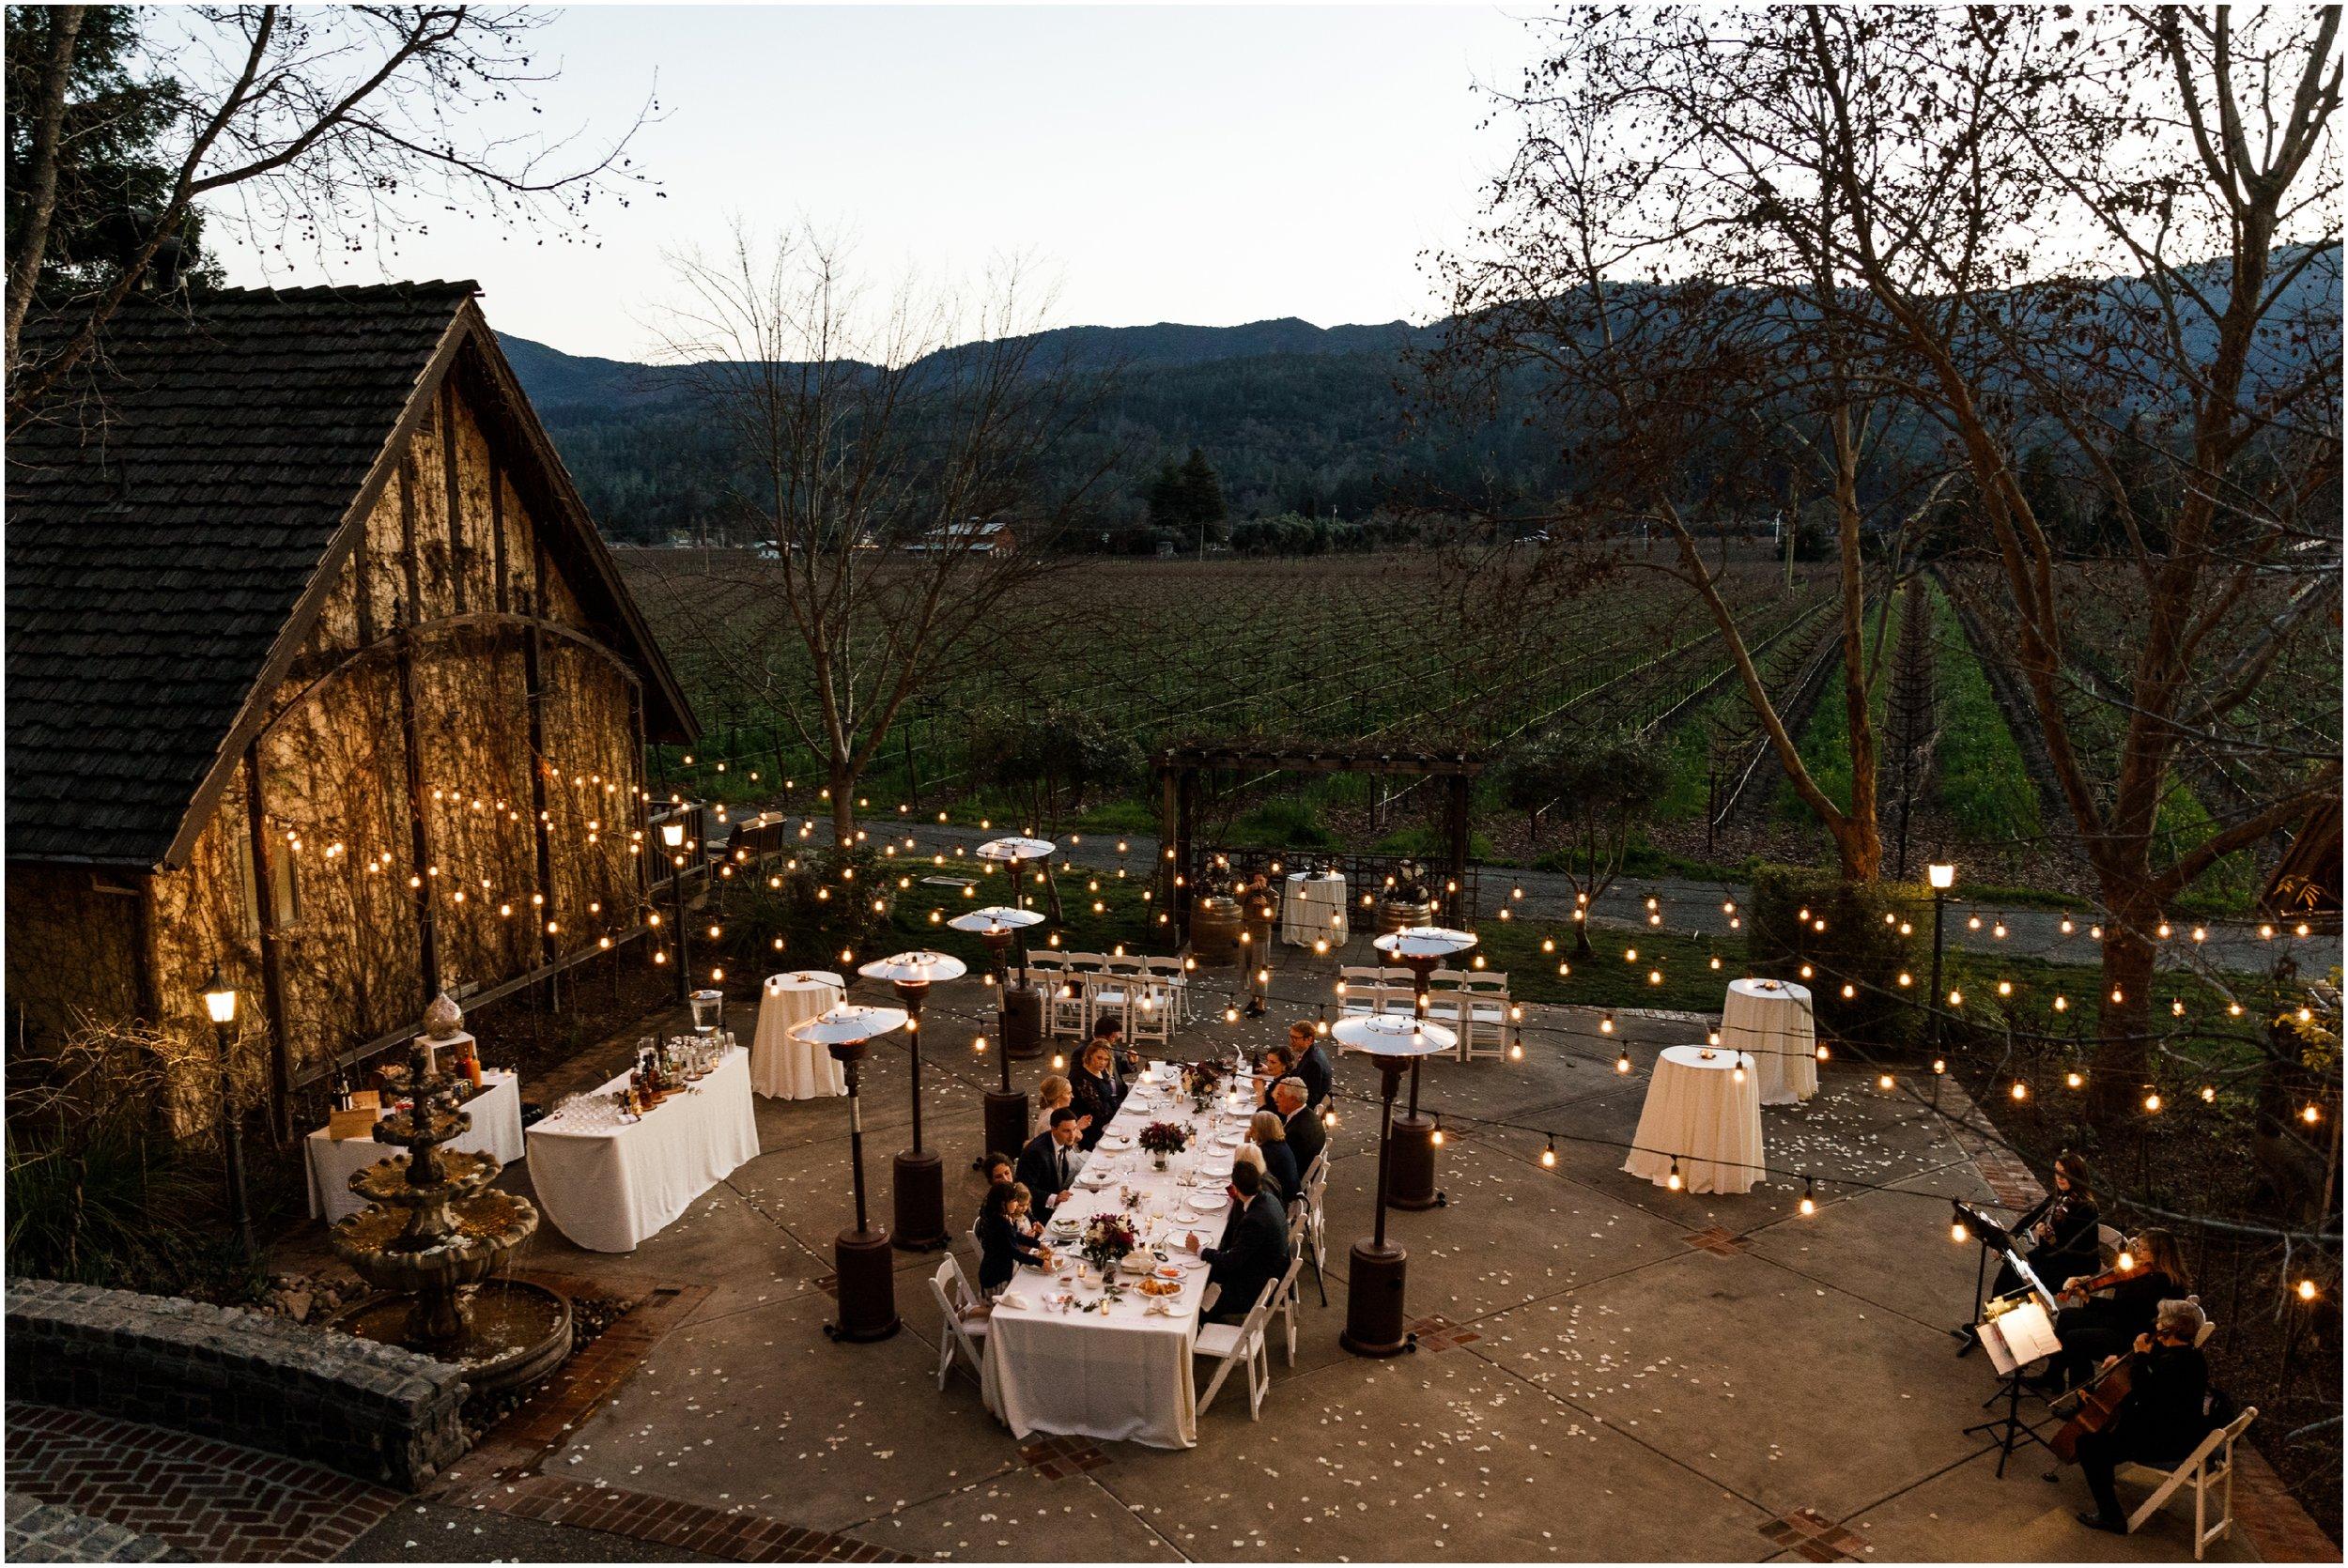 wedding reception at the Harvest Inn during dusk